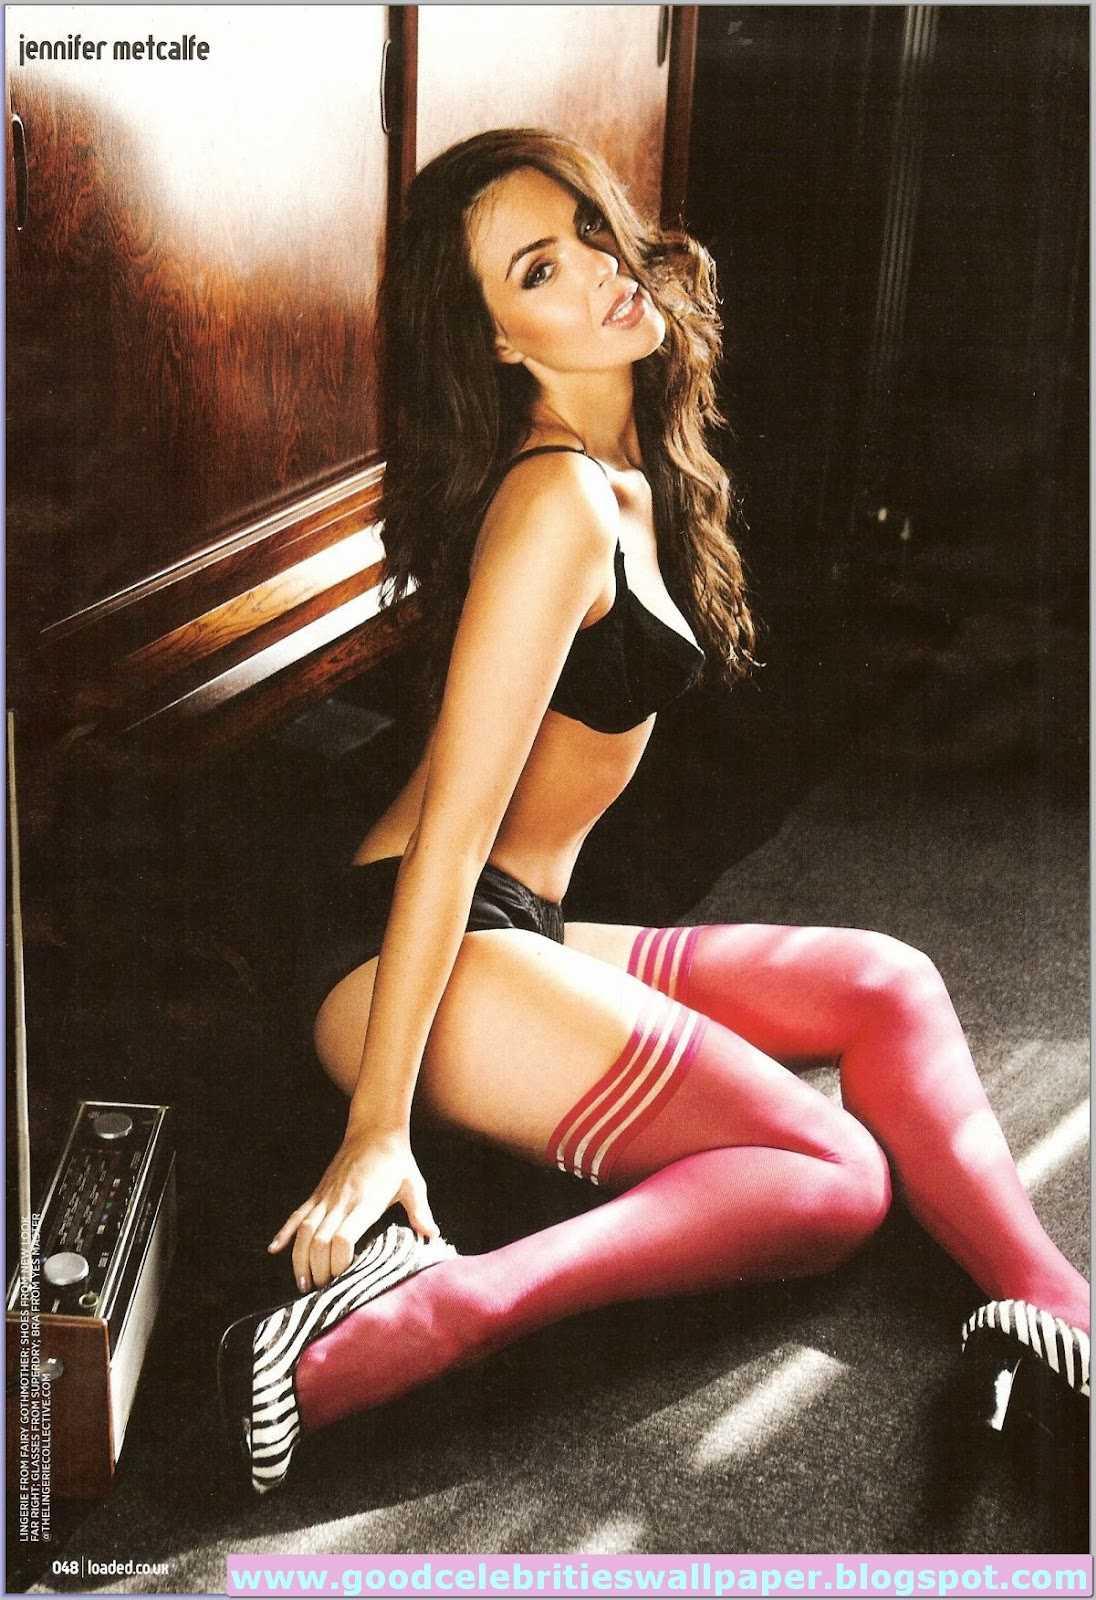 Jennifer Metcalfe hot feet pic